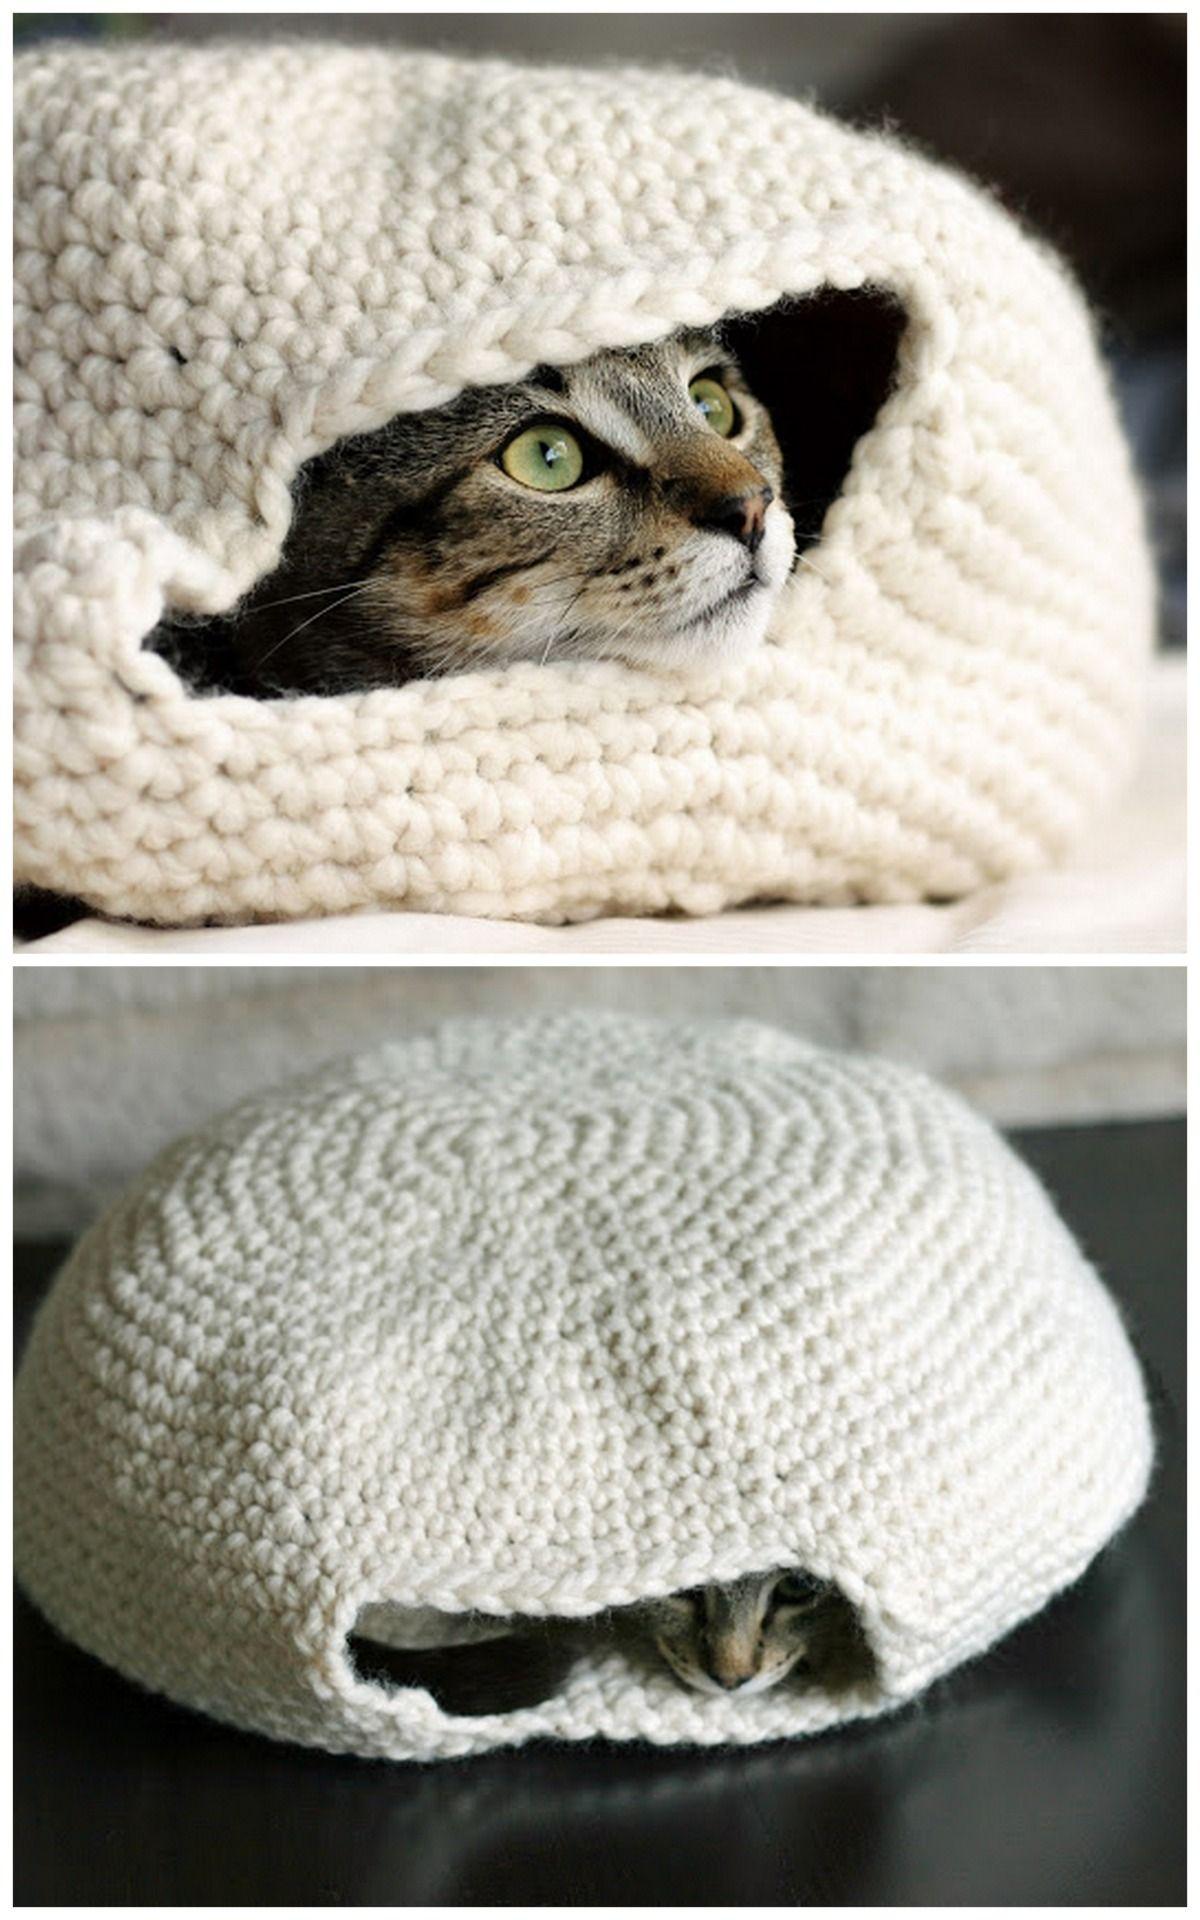 "DIY Crochet Cat Nest ""Muffin Oven"" Pattern by Eilen Tein on Ravelry ..."